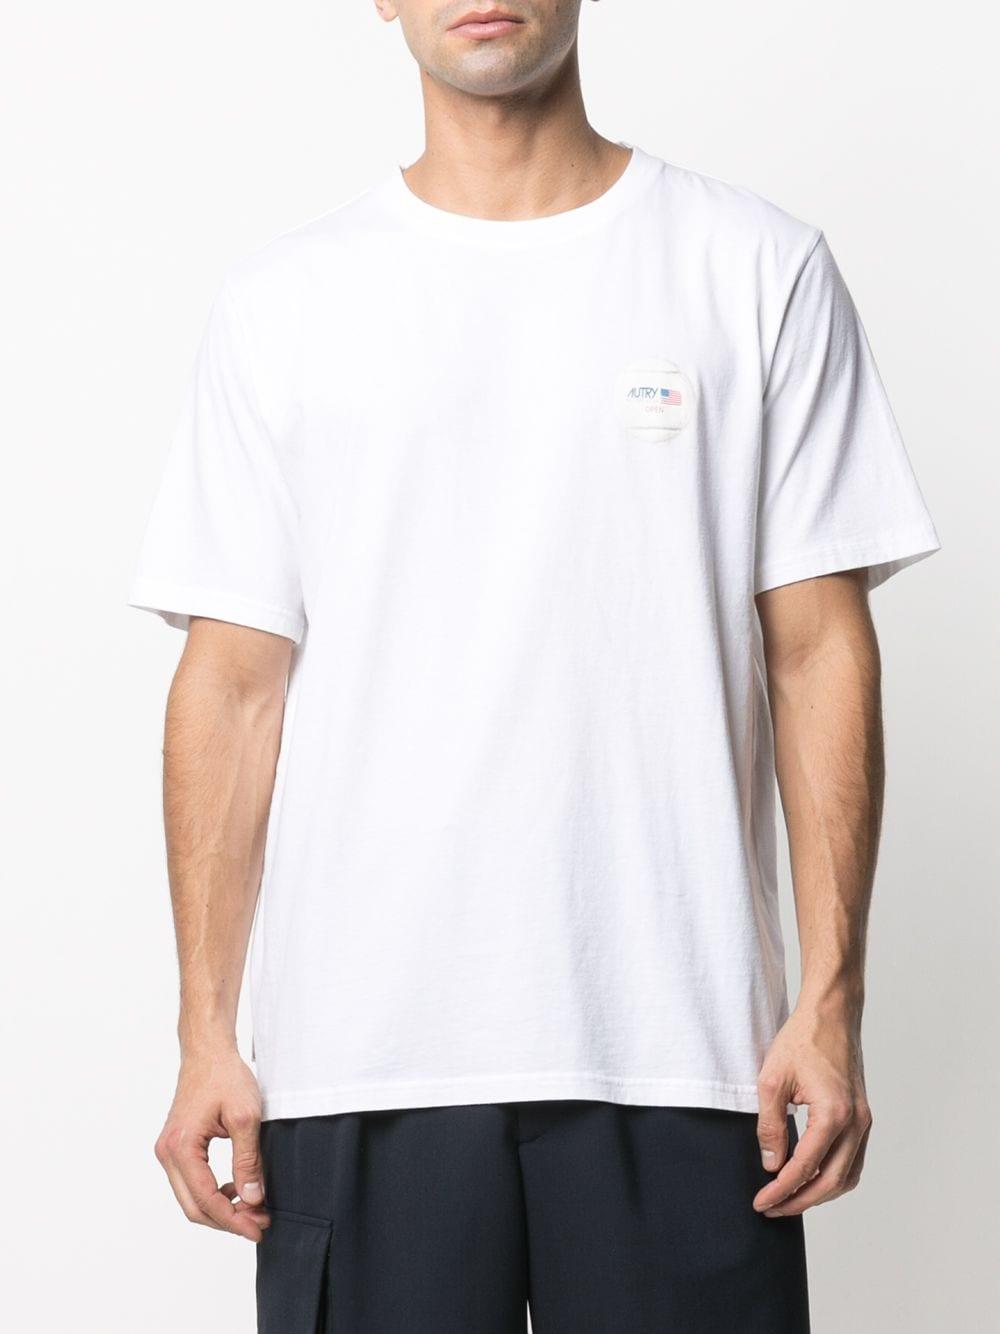 Autry t-shirt con logo uomo AUTRY | T-shirt | TSXMA01M